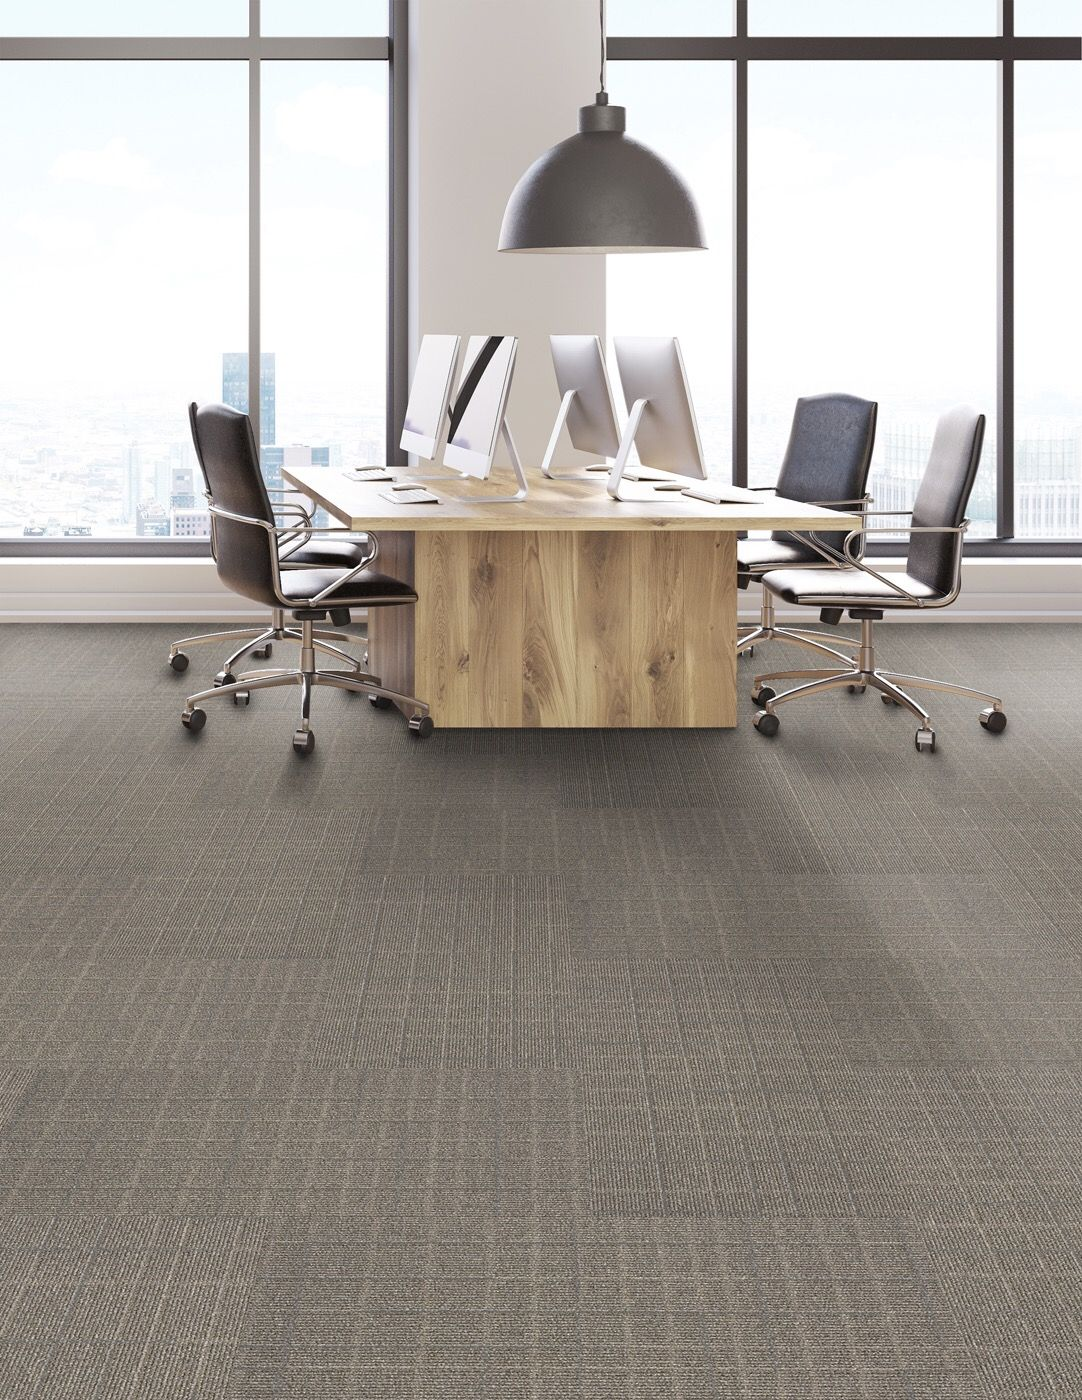 Flashback Tile By Ef Contract 18 X 36 Installation Methods Are Ashlar Herringbone Shown Coordinates Carpet Tiles Luxury Vinyl Tile Commercial Carpet